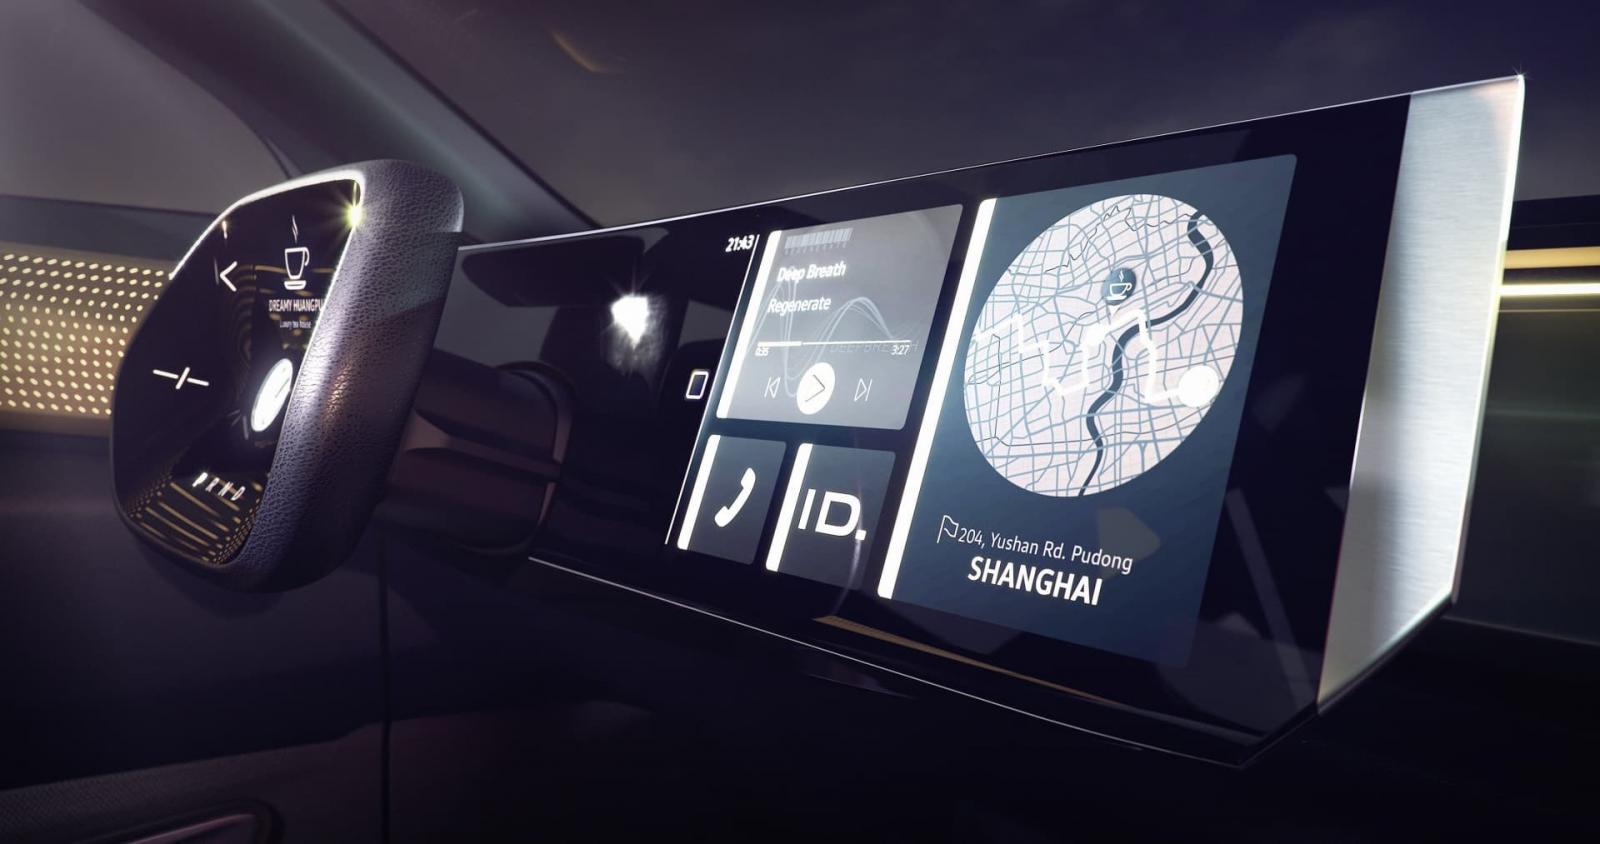 La Volkswagen I.D. Roomzz tendrá nivel de autonomía 4